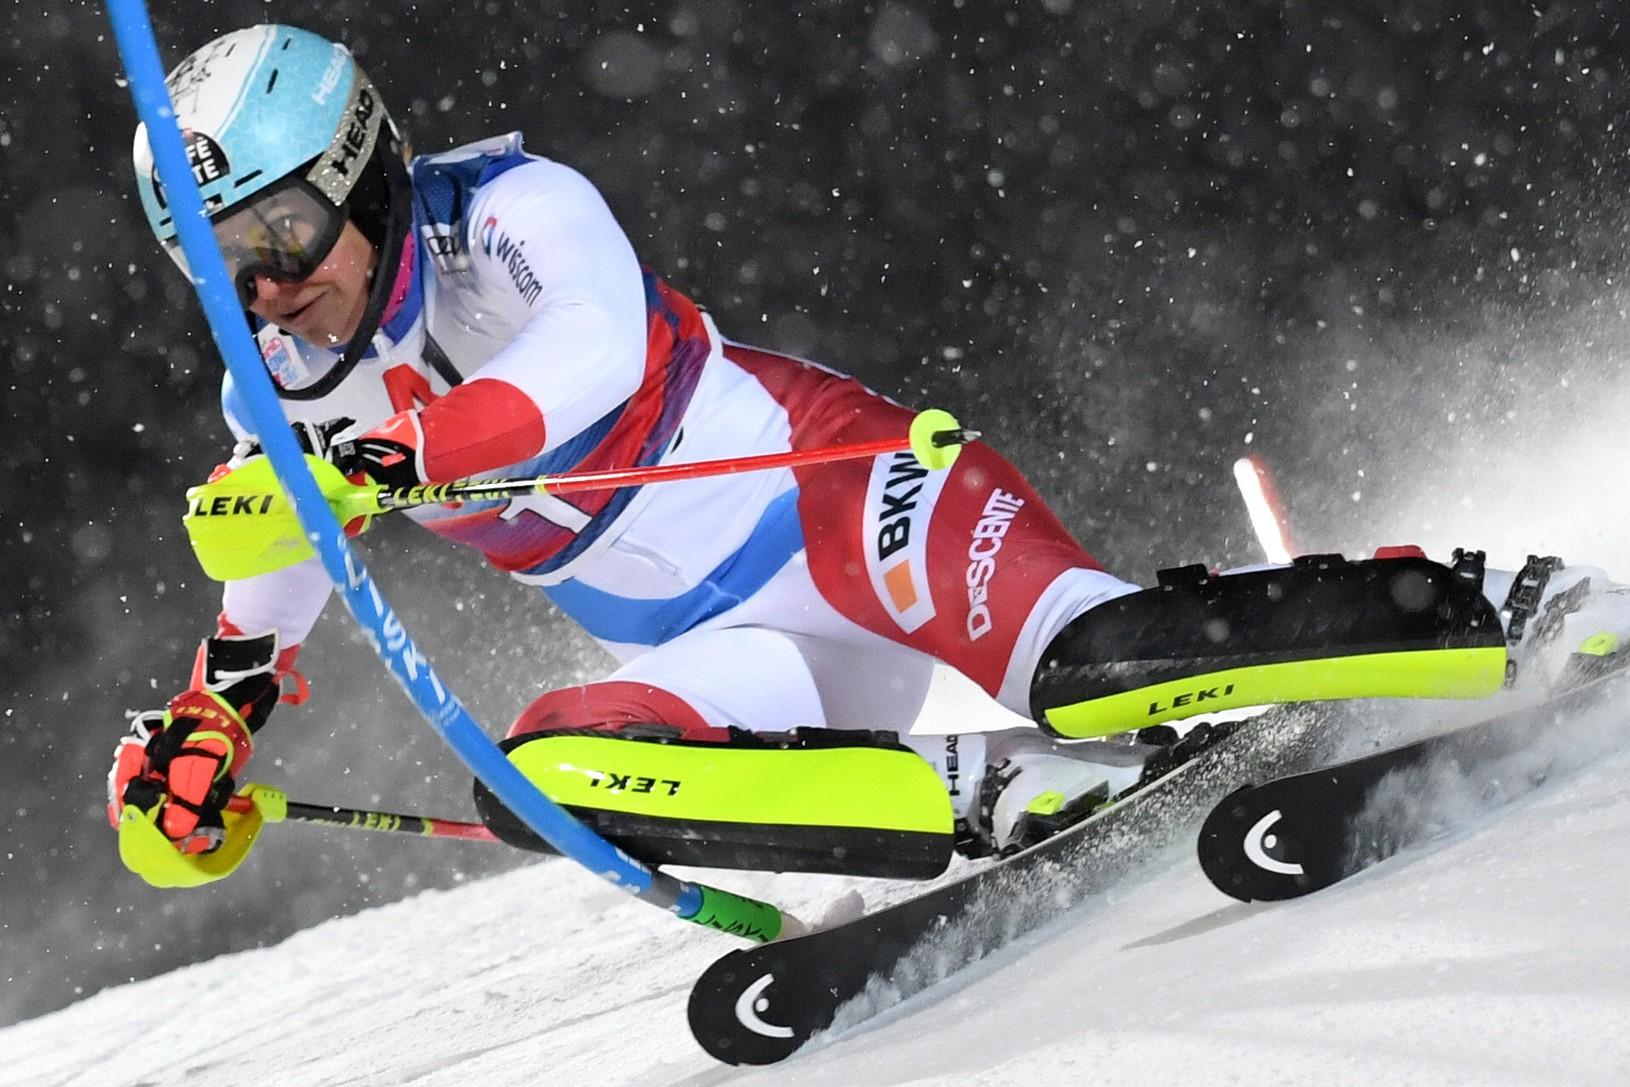 Švajčiarska lyžiarka Wendy Holdenerová